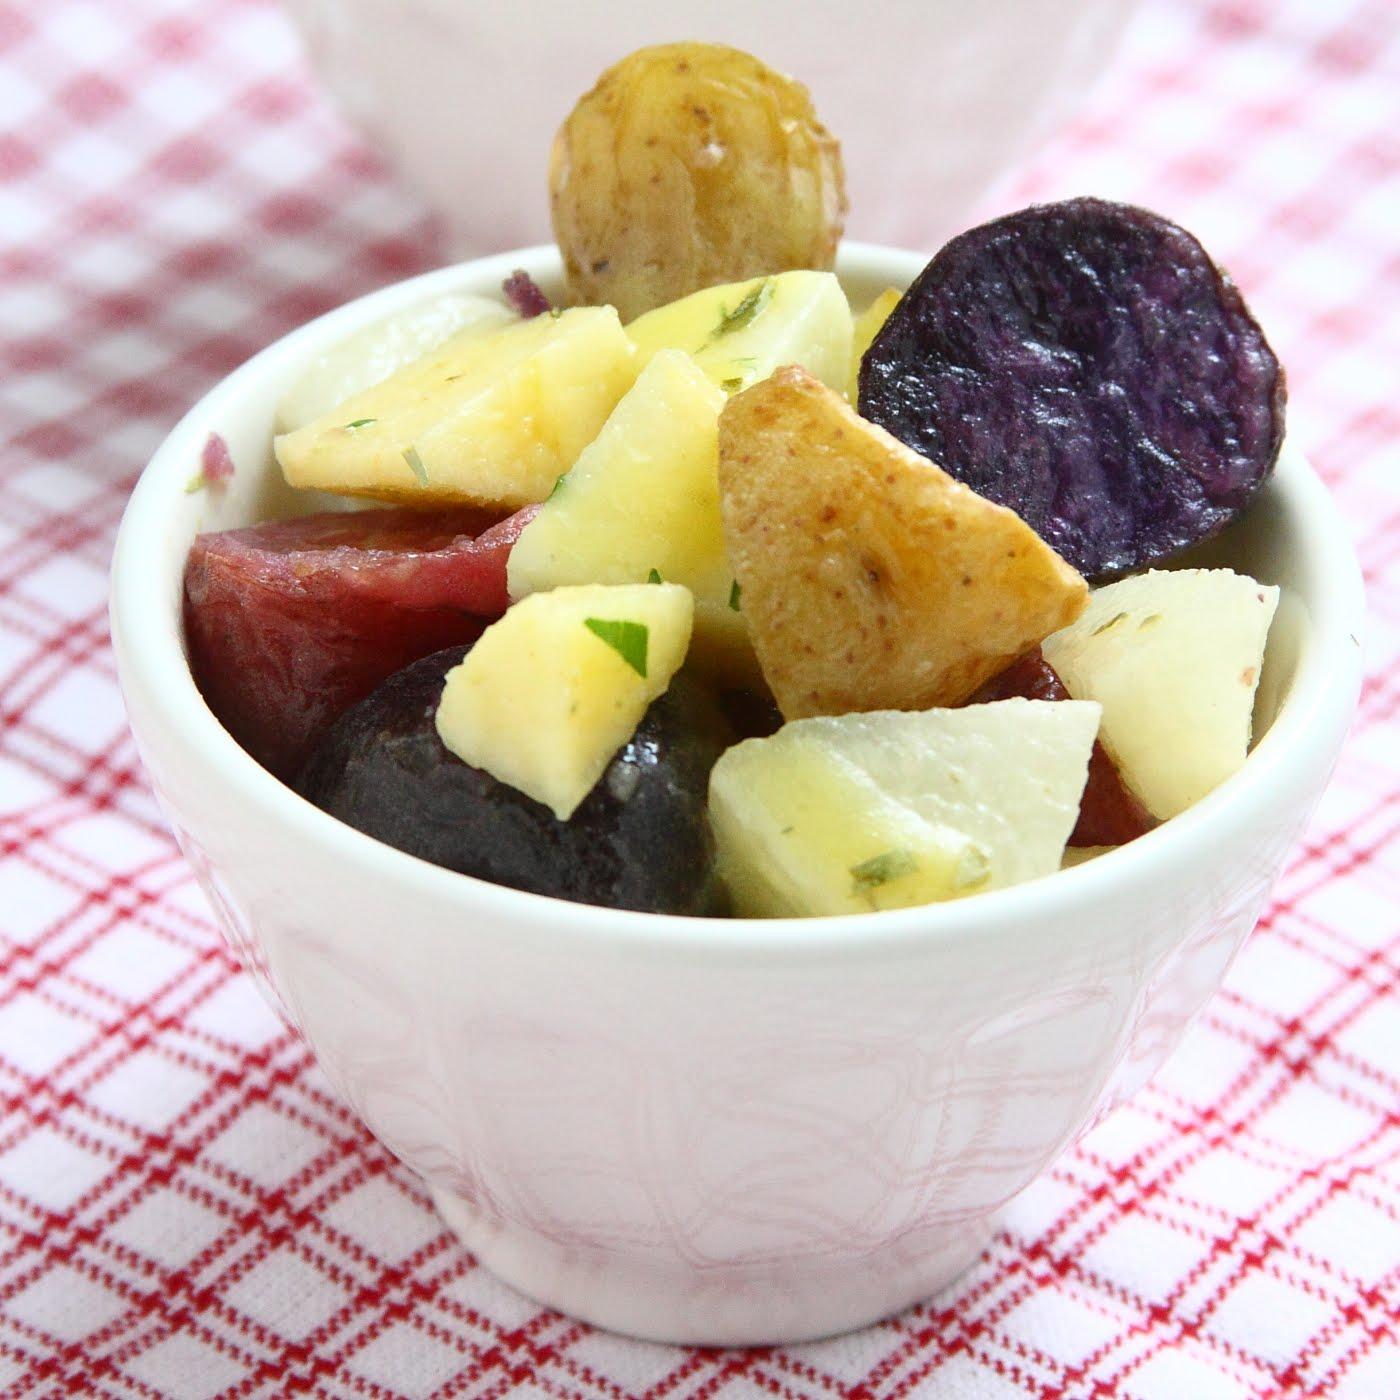 Is Potato Salad Heart Healthy